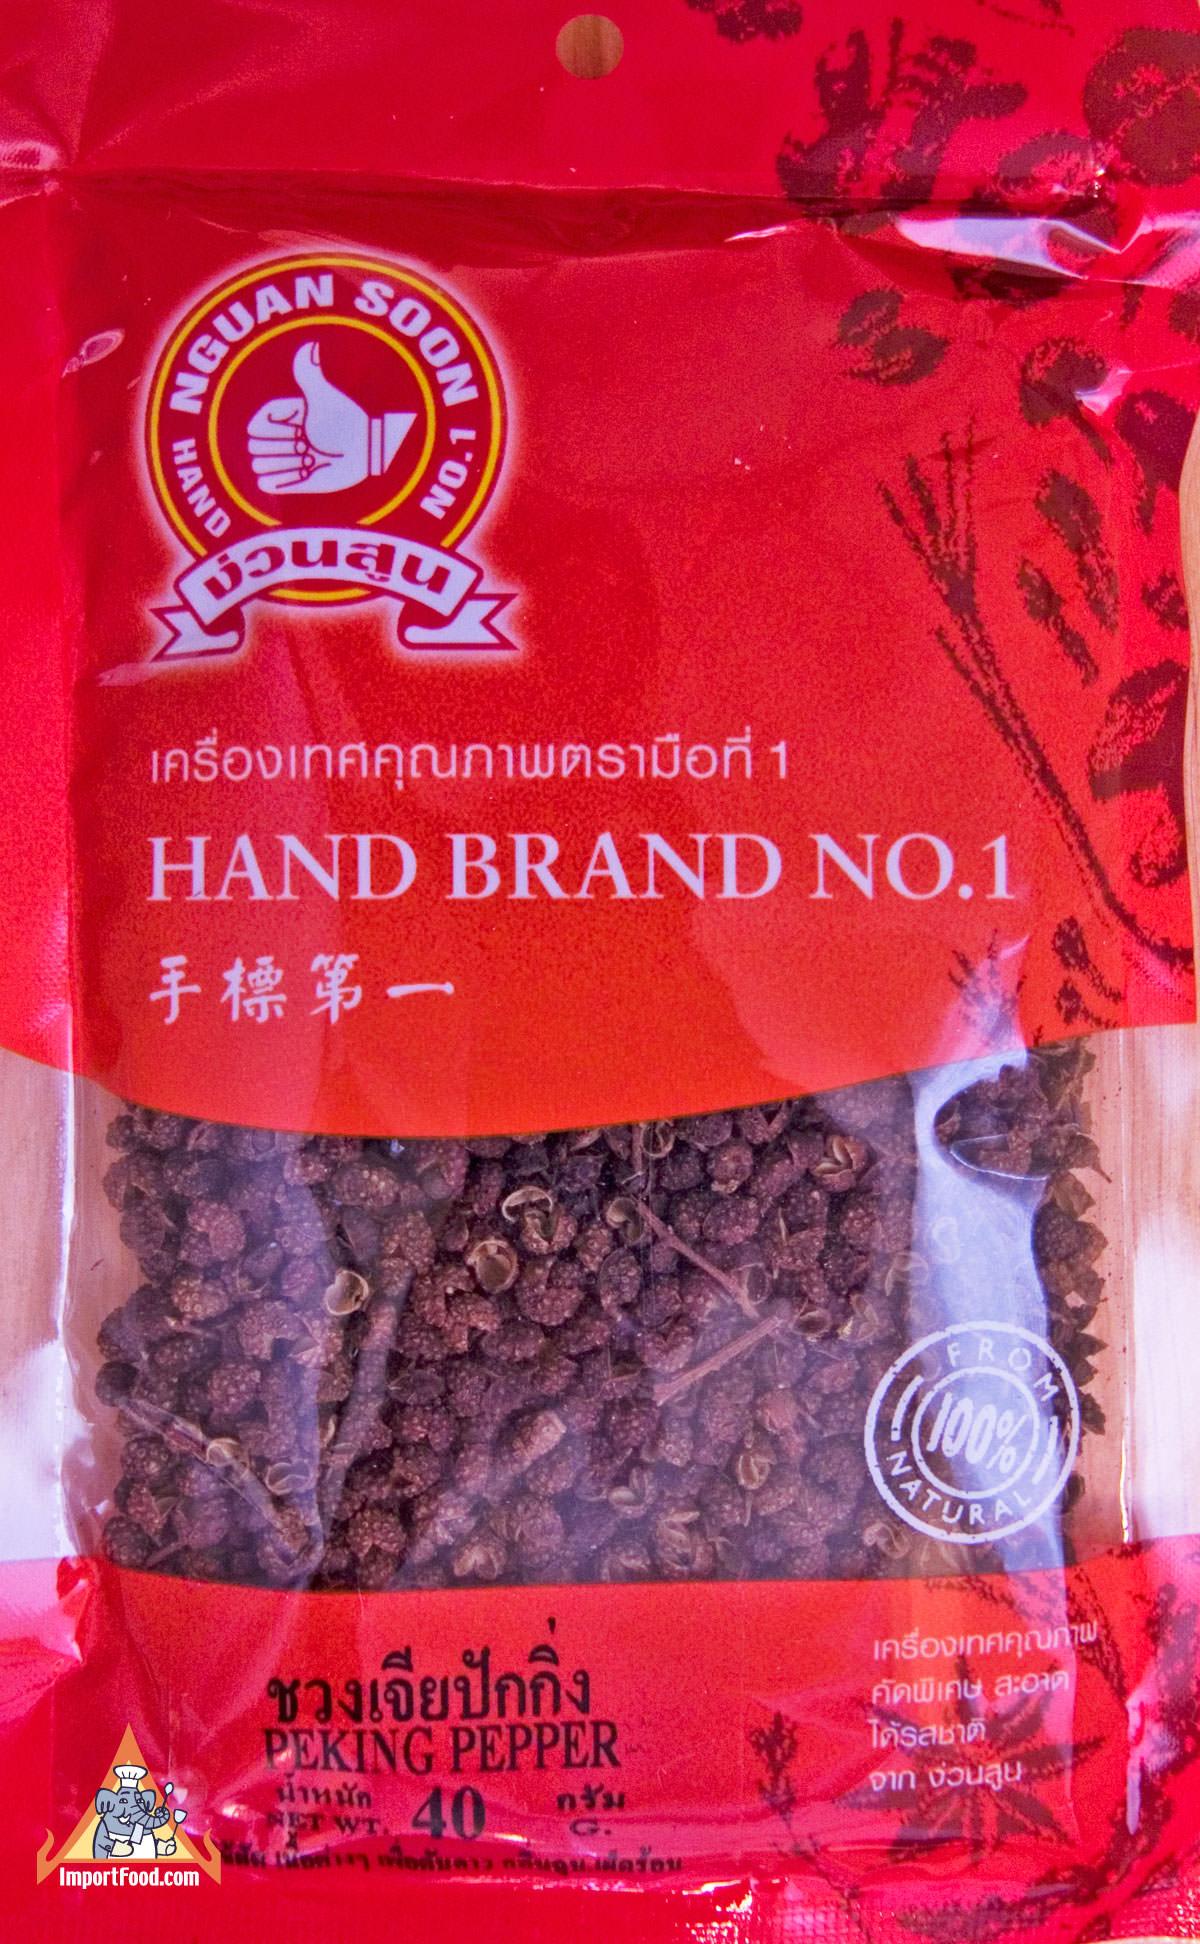 Peking Peppercorn